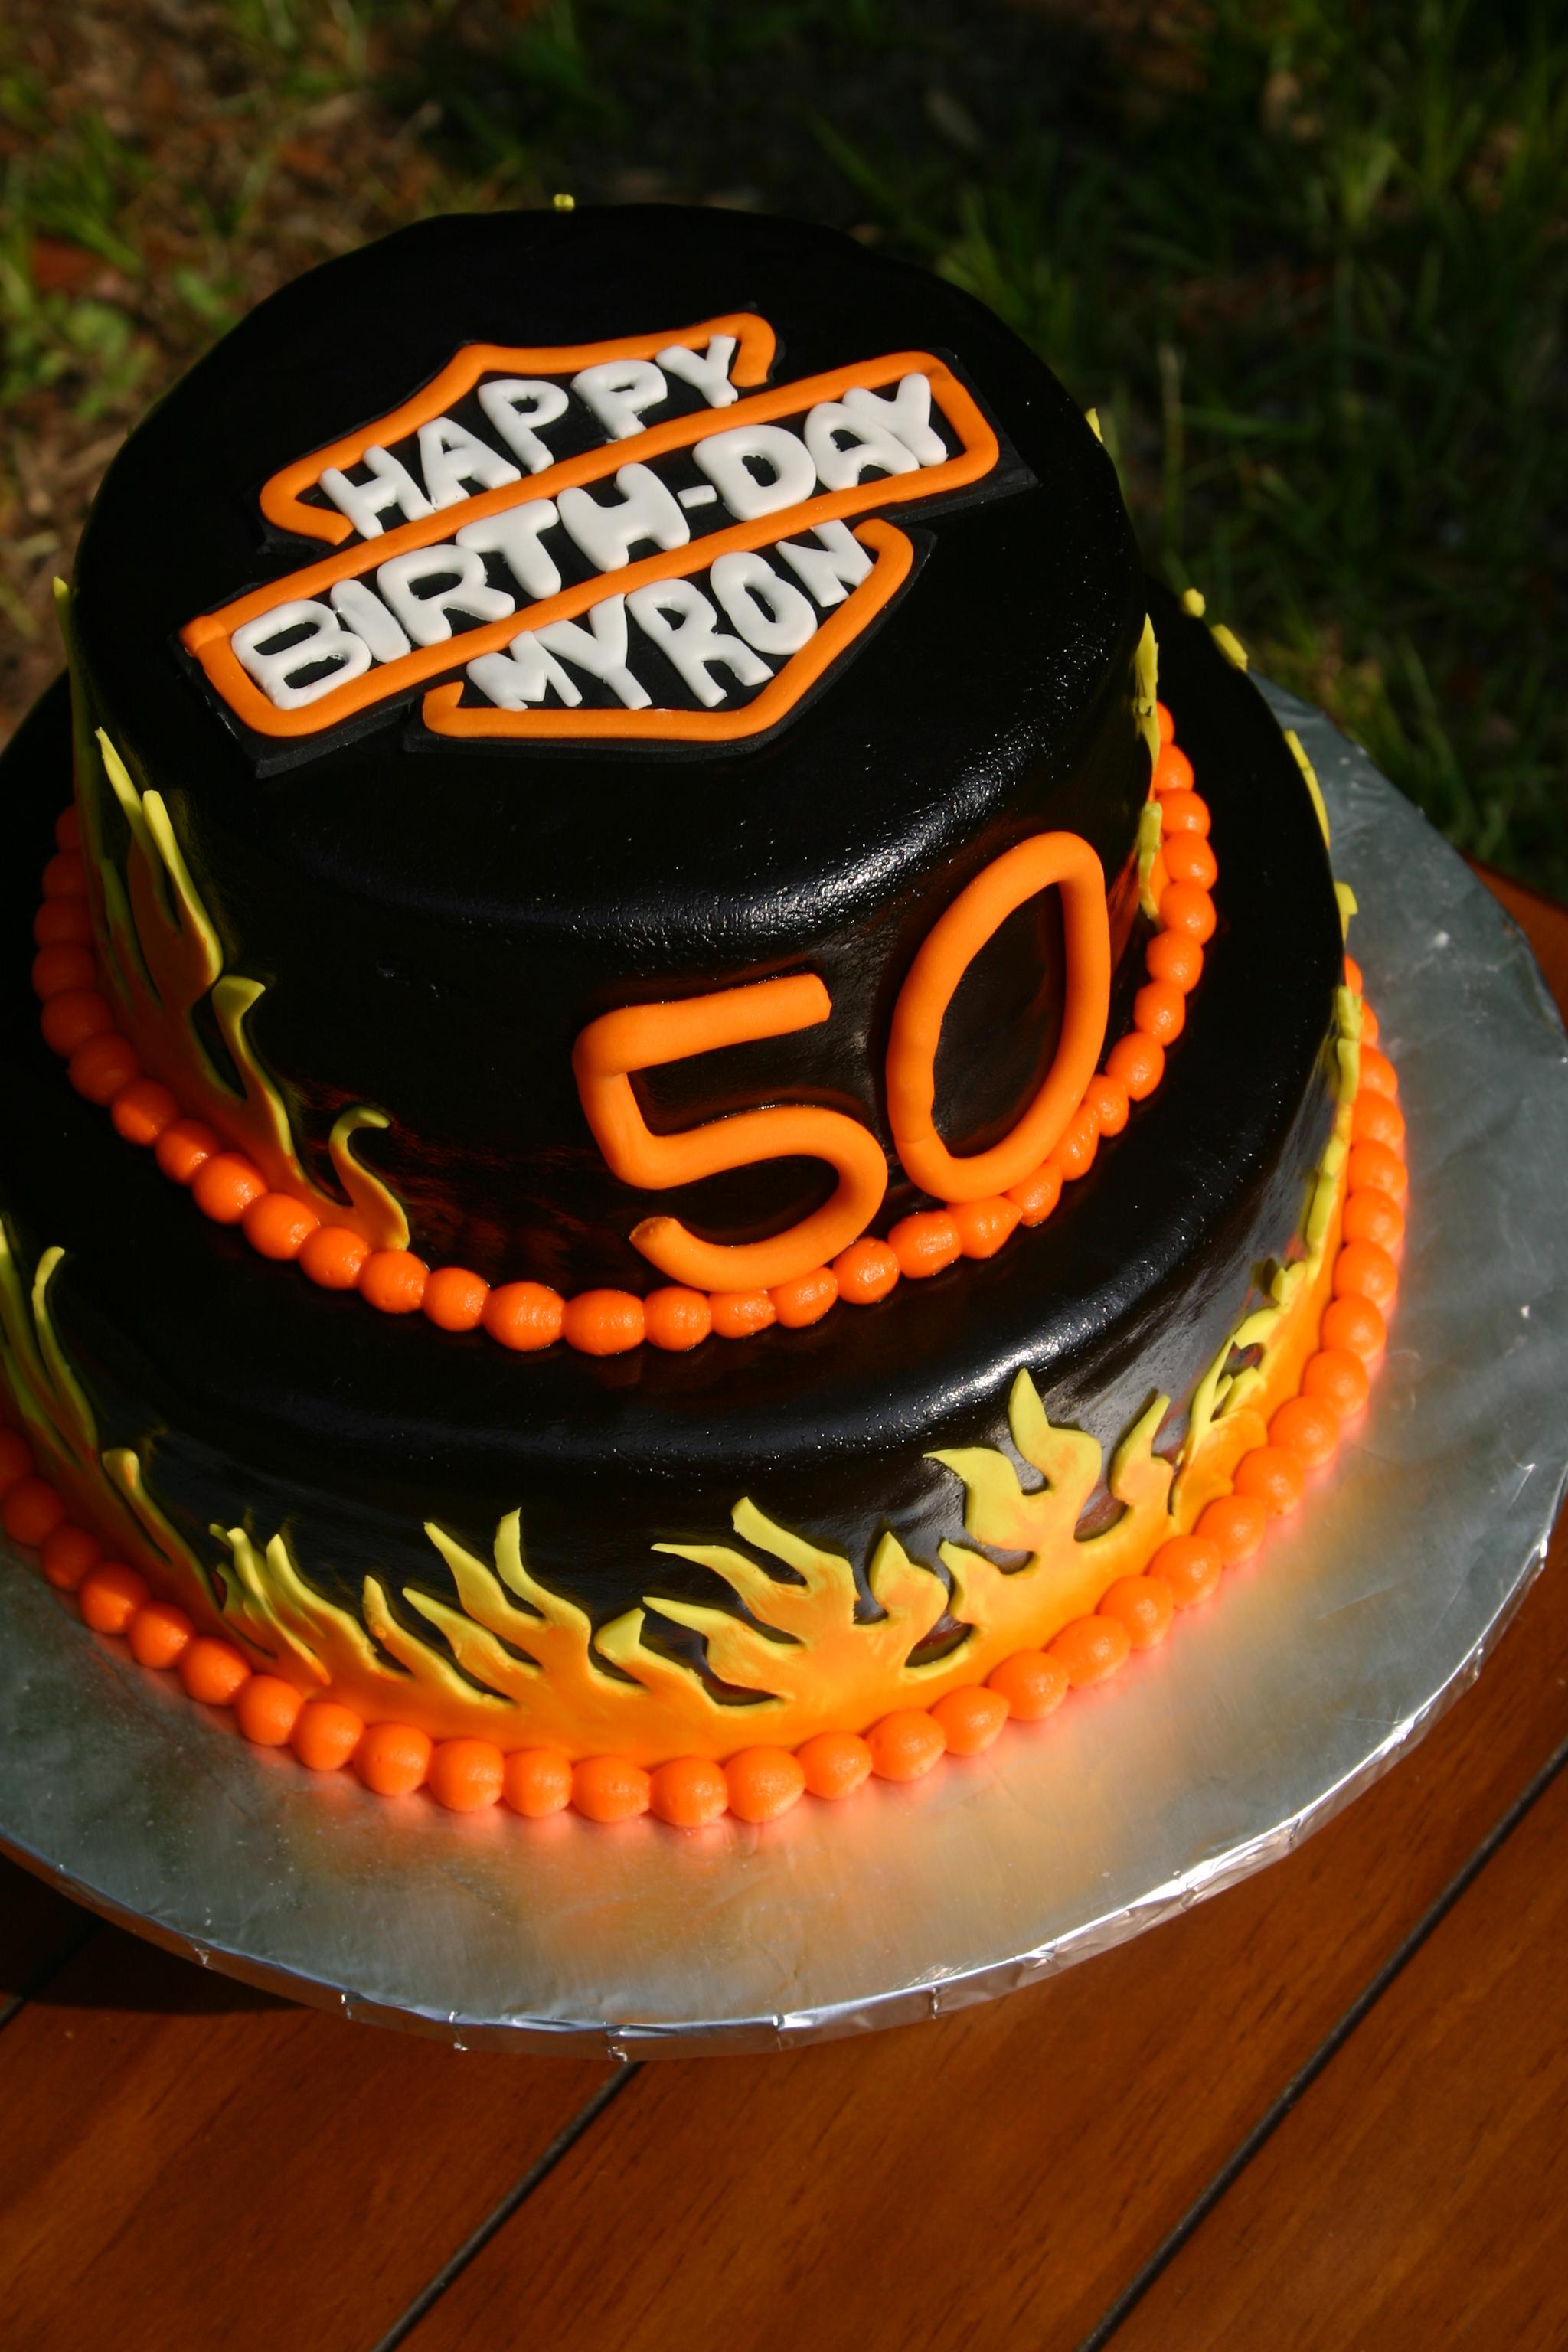 Strange Harley Davidson Cake Lolos Cakes Sweets Funny Birthday Cards Online Fluifree Goldxyz